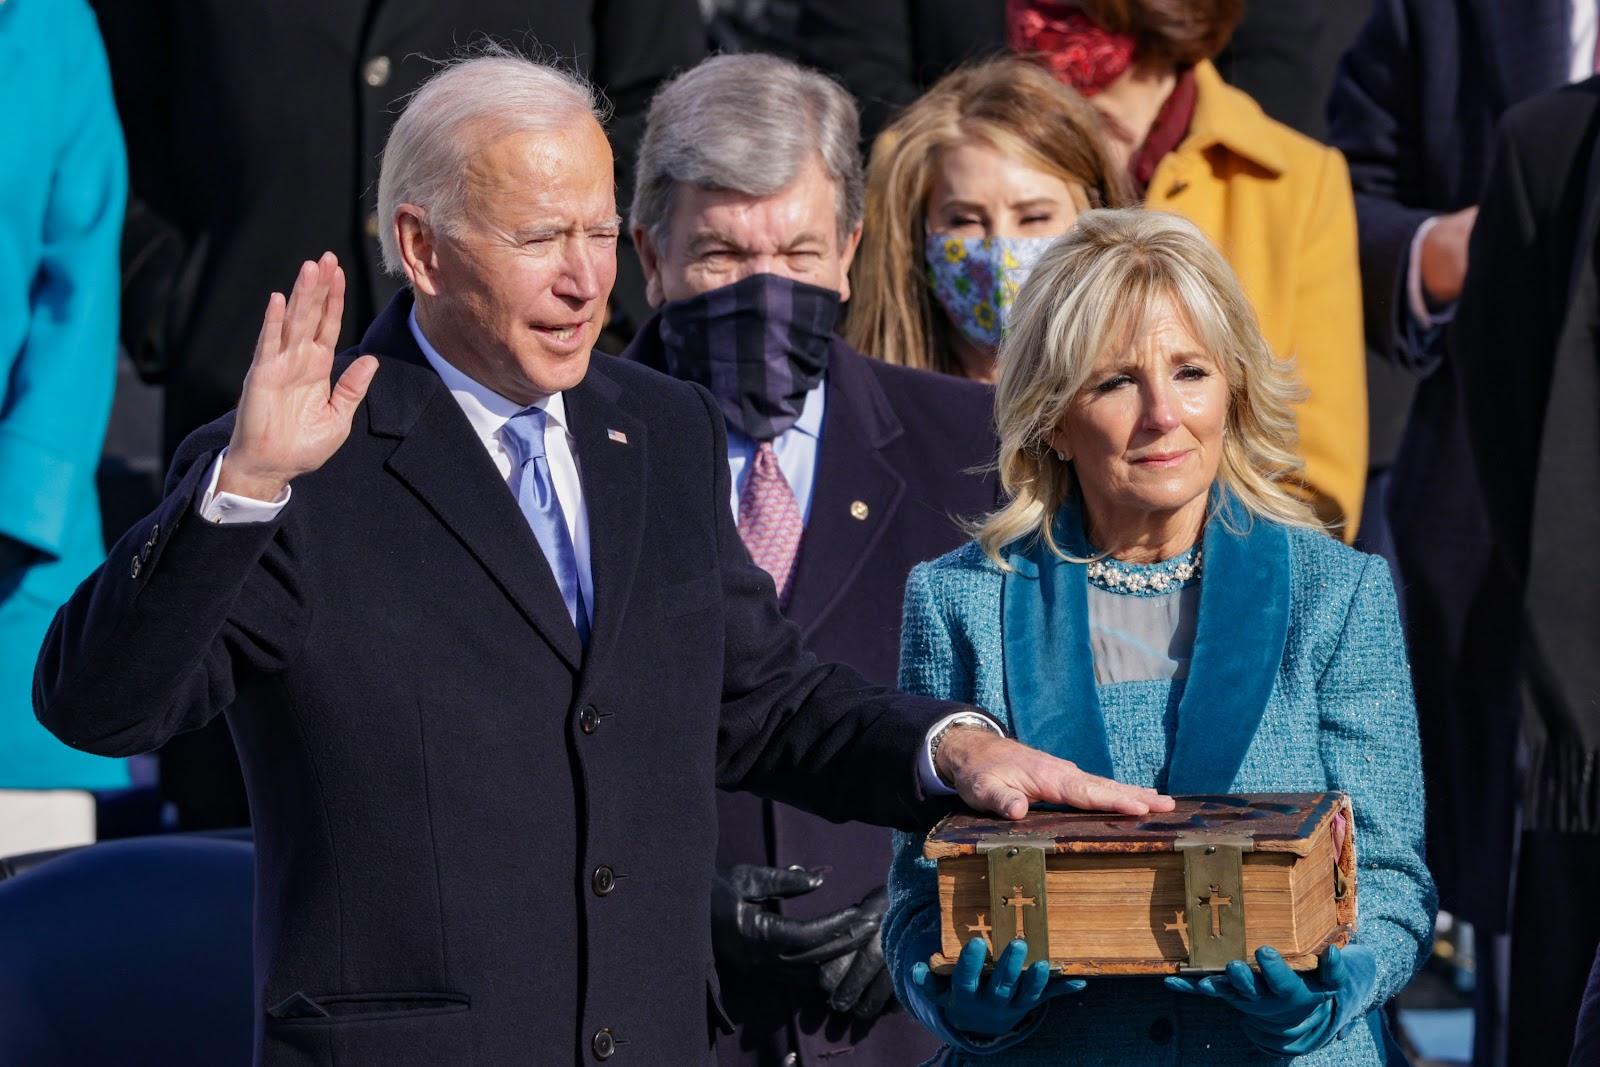 PHOTOS: The Inauguration Of Joe Biden And Kamala Harris | WBUR News